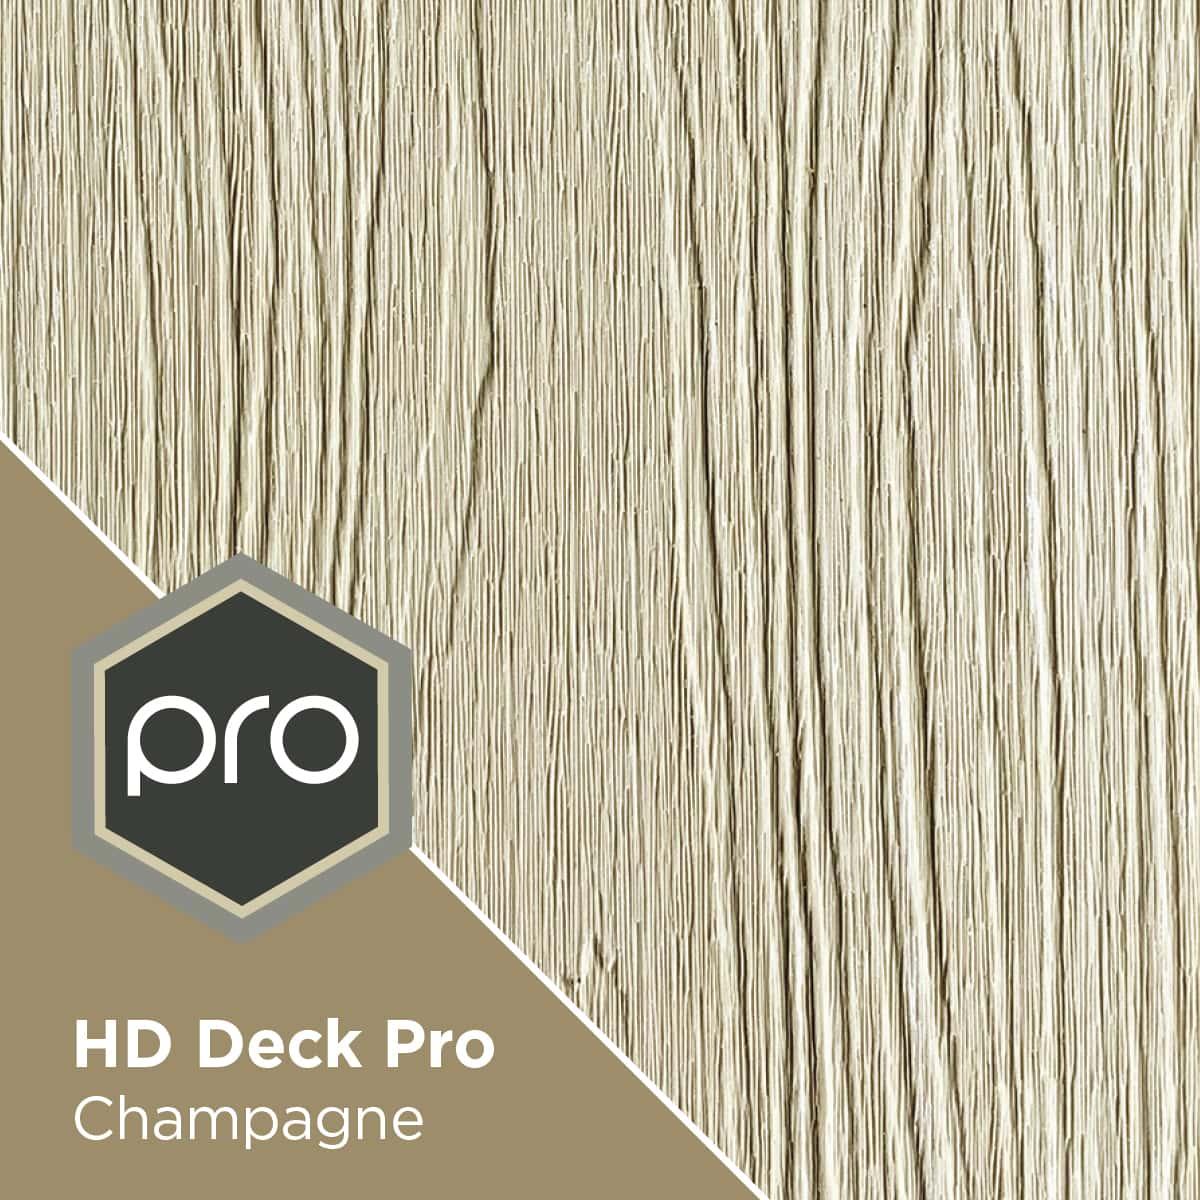 HD Deck Pro Champagne